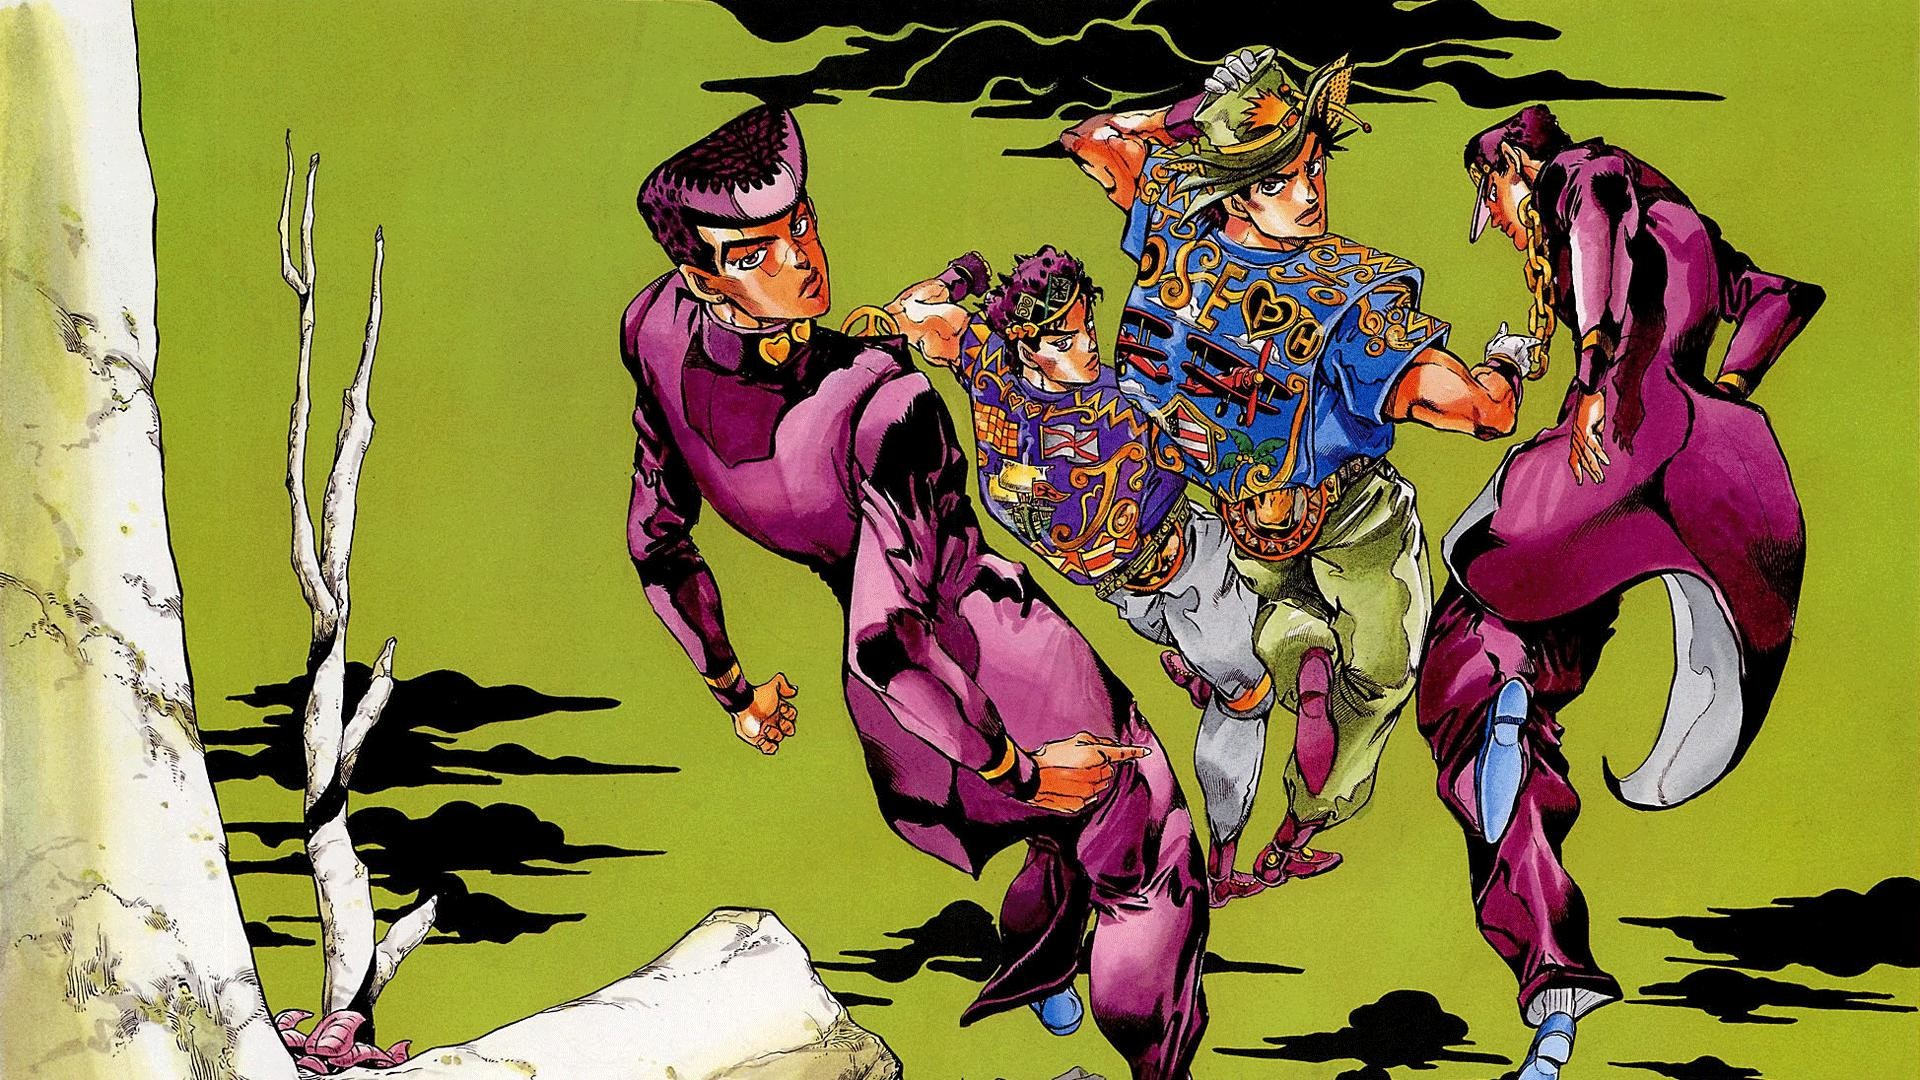 Anime – Jojo's Bizarre Adventure Jonathan Joestar Joseph Joestar Jotaro  Kujo Josuke Higashikata Bakgrund